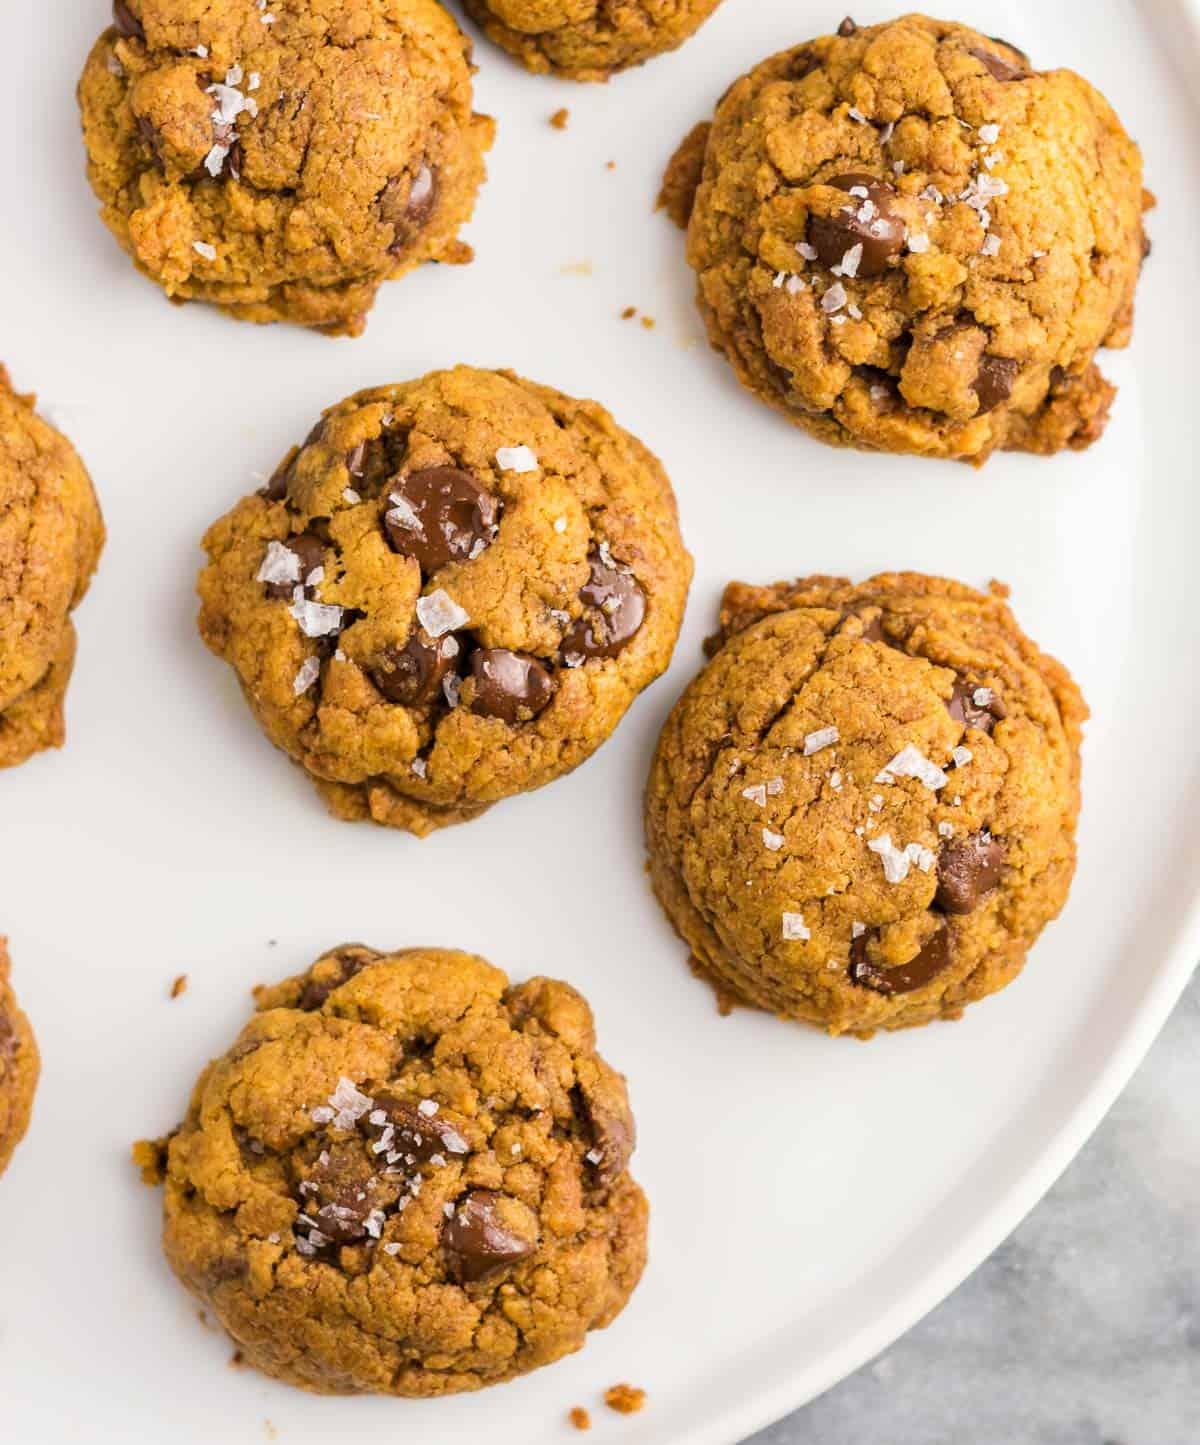 vegan pumpkin cookies on a plate